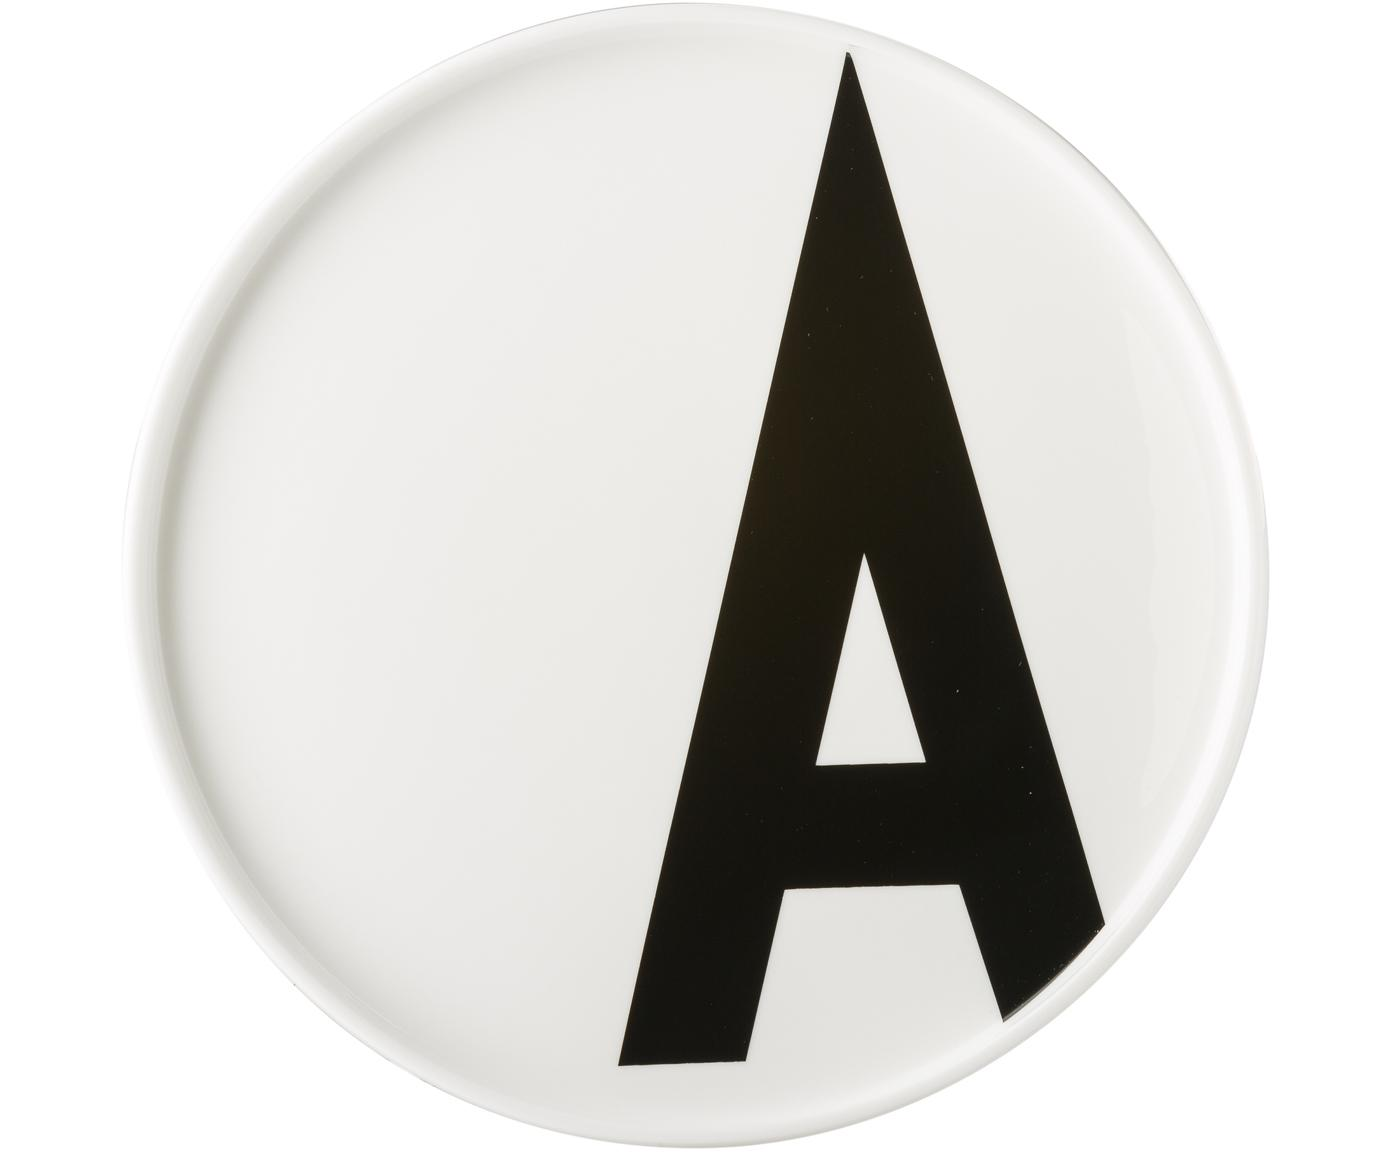 Plato Personal (variantes de A a Z), Porcelana fina, Blanco, negro, Ø 22 x Al 2 cm